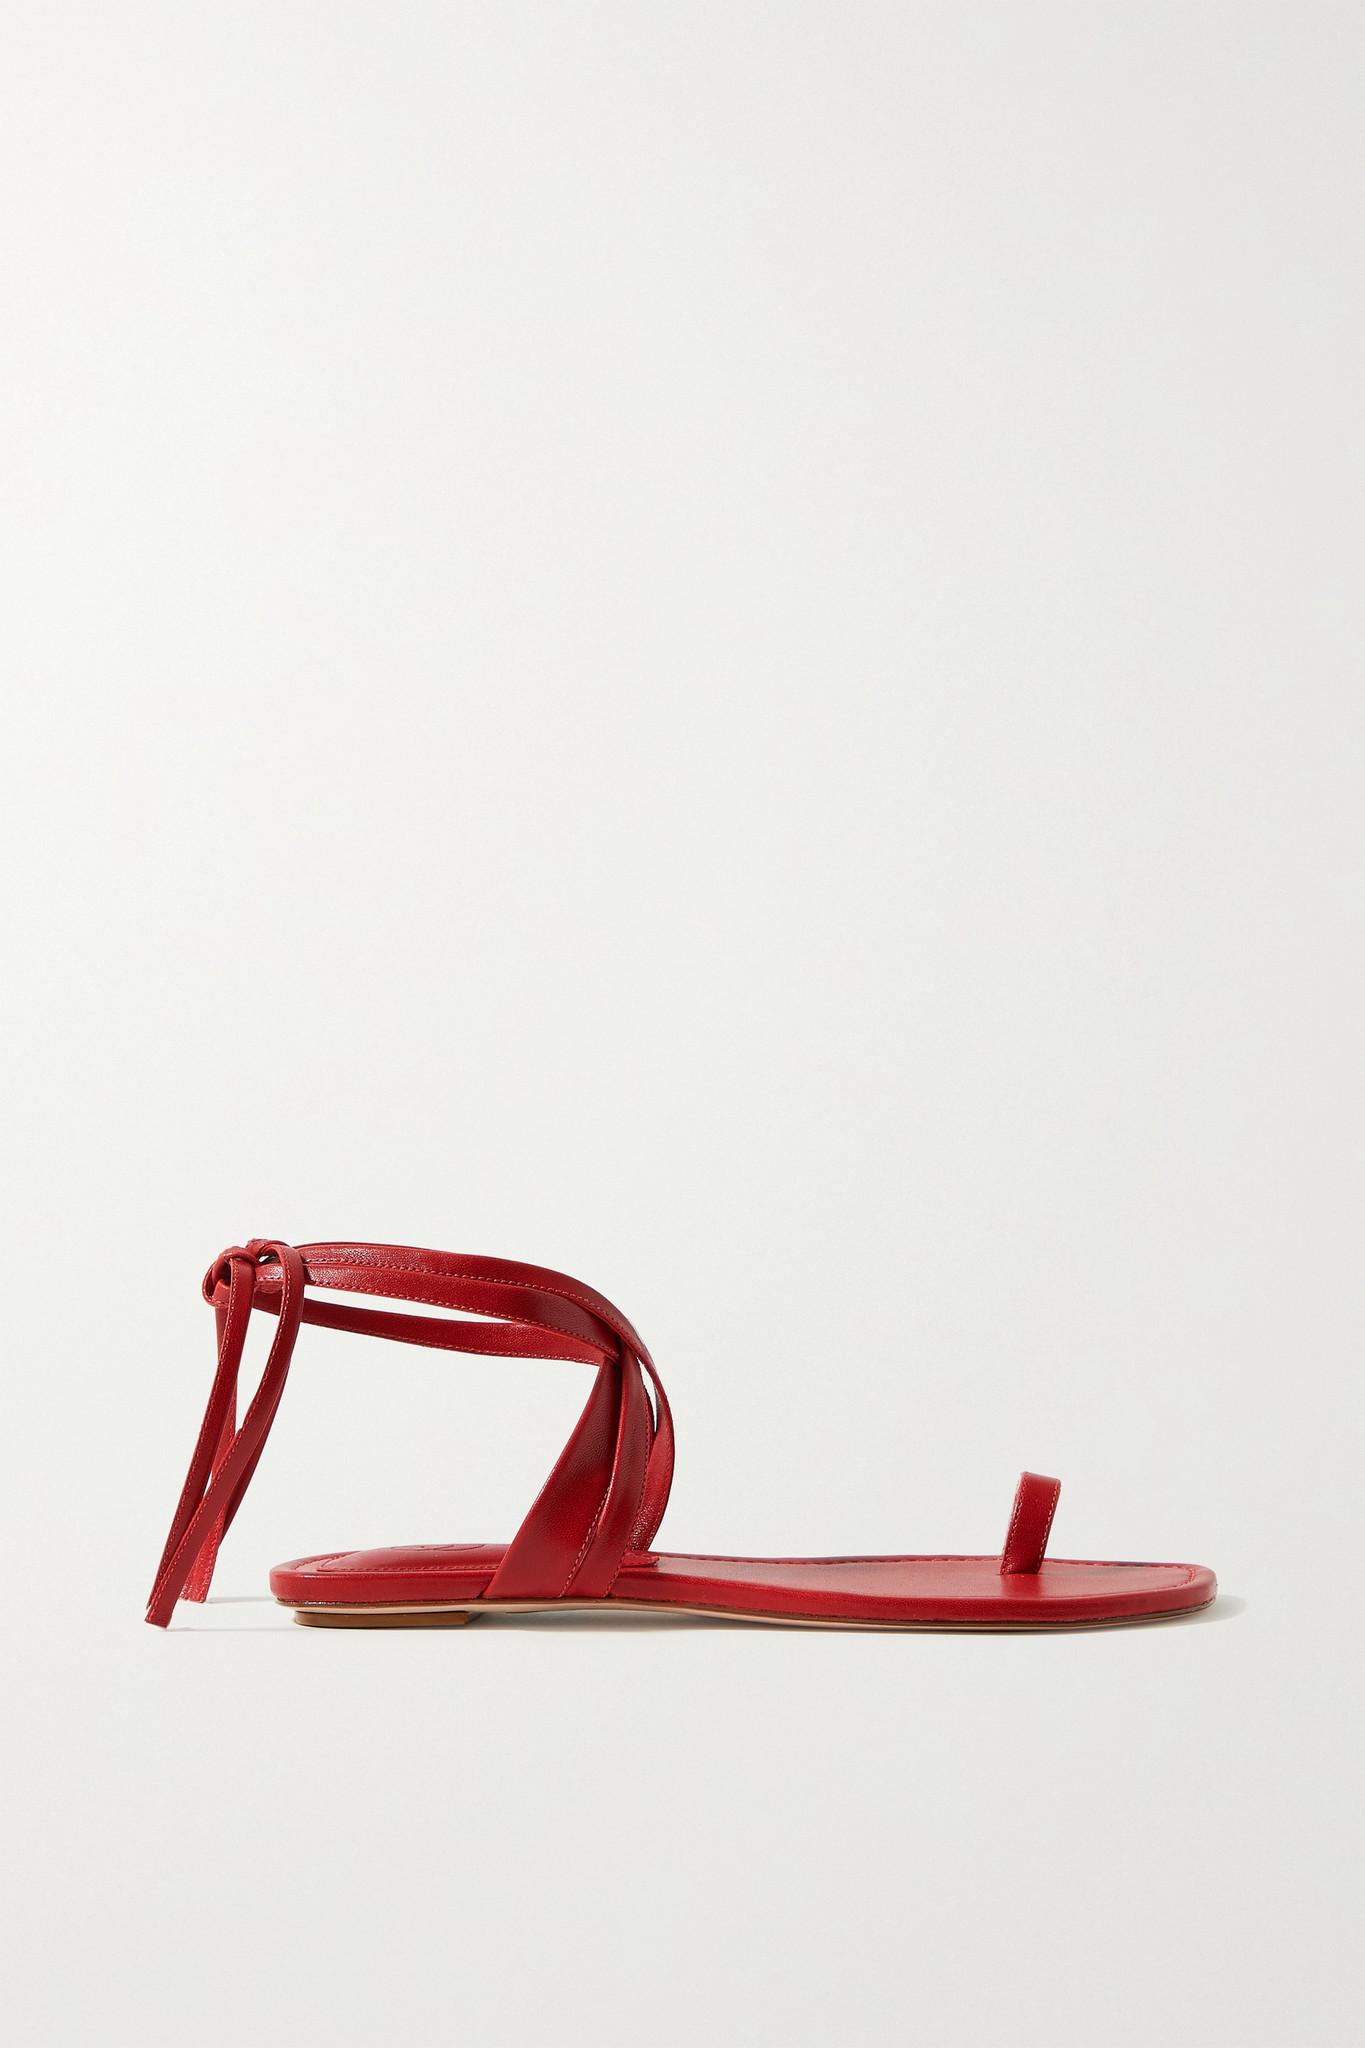 PORTE & PAIRE - 皮革凉鞋 - 红色 - IT38.5